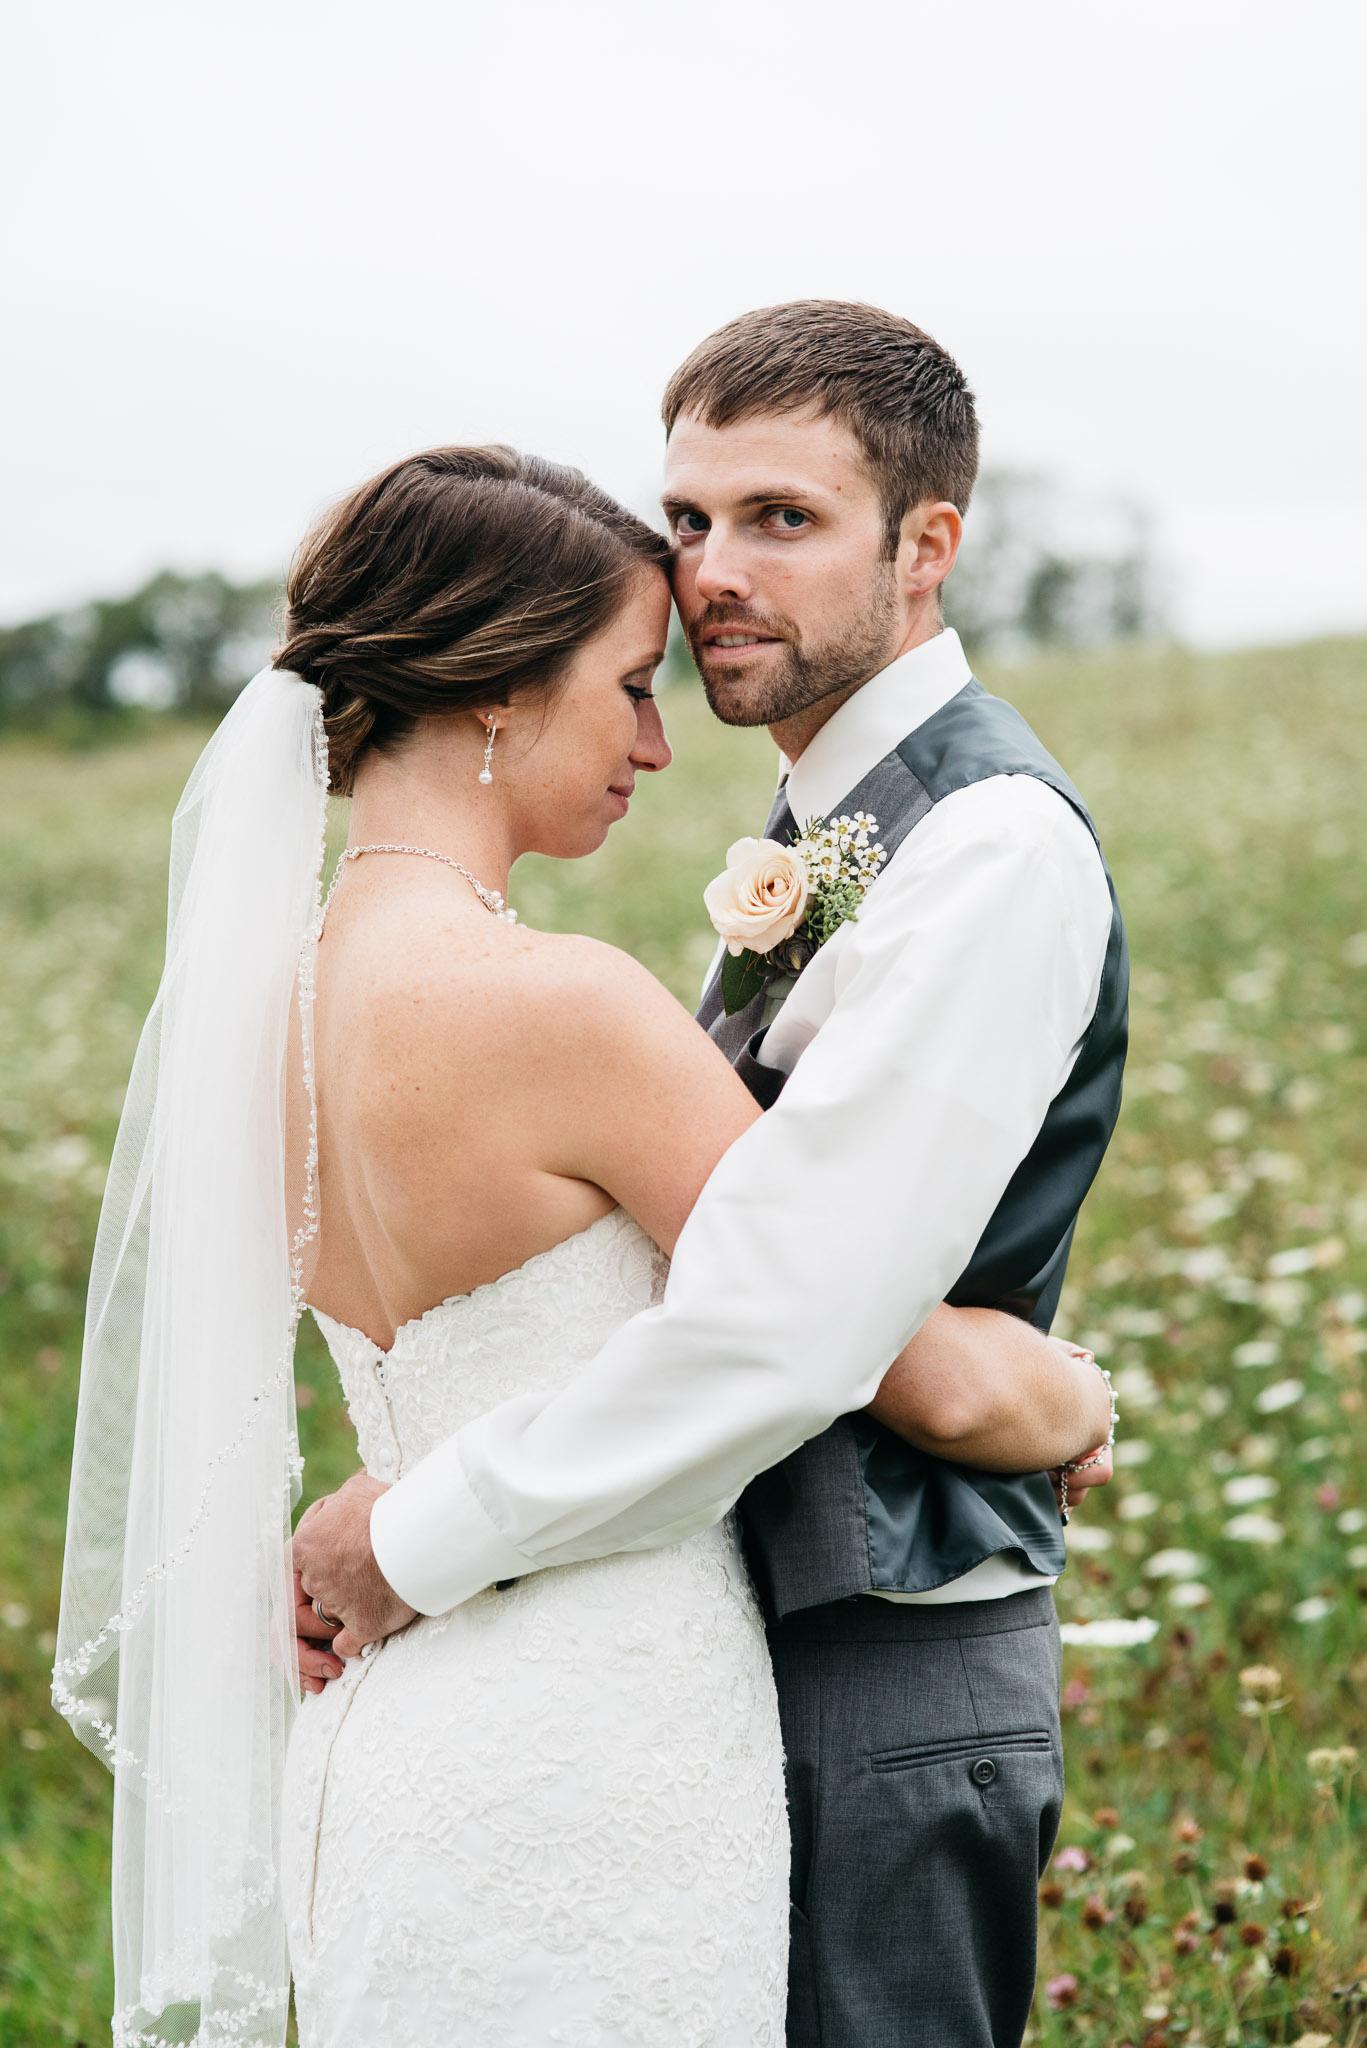 Mariah Fisher Photography Rockwood PA wedding photographer.jpg